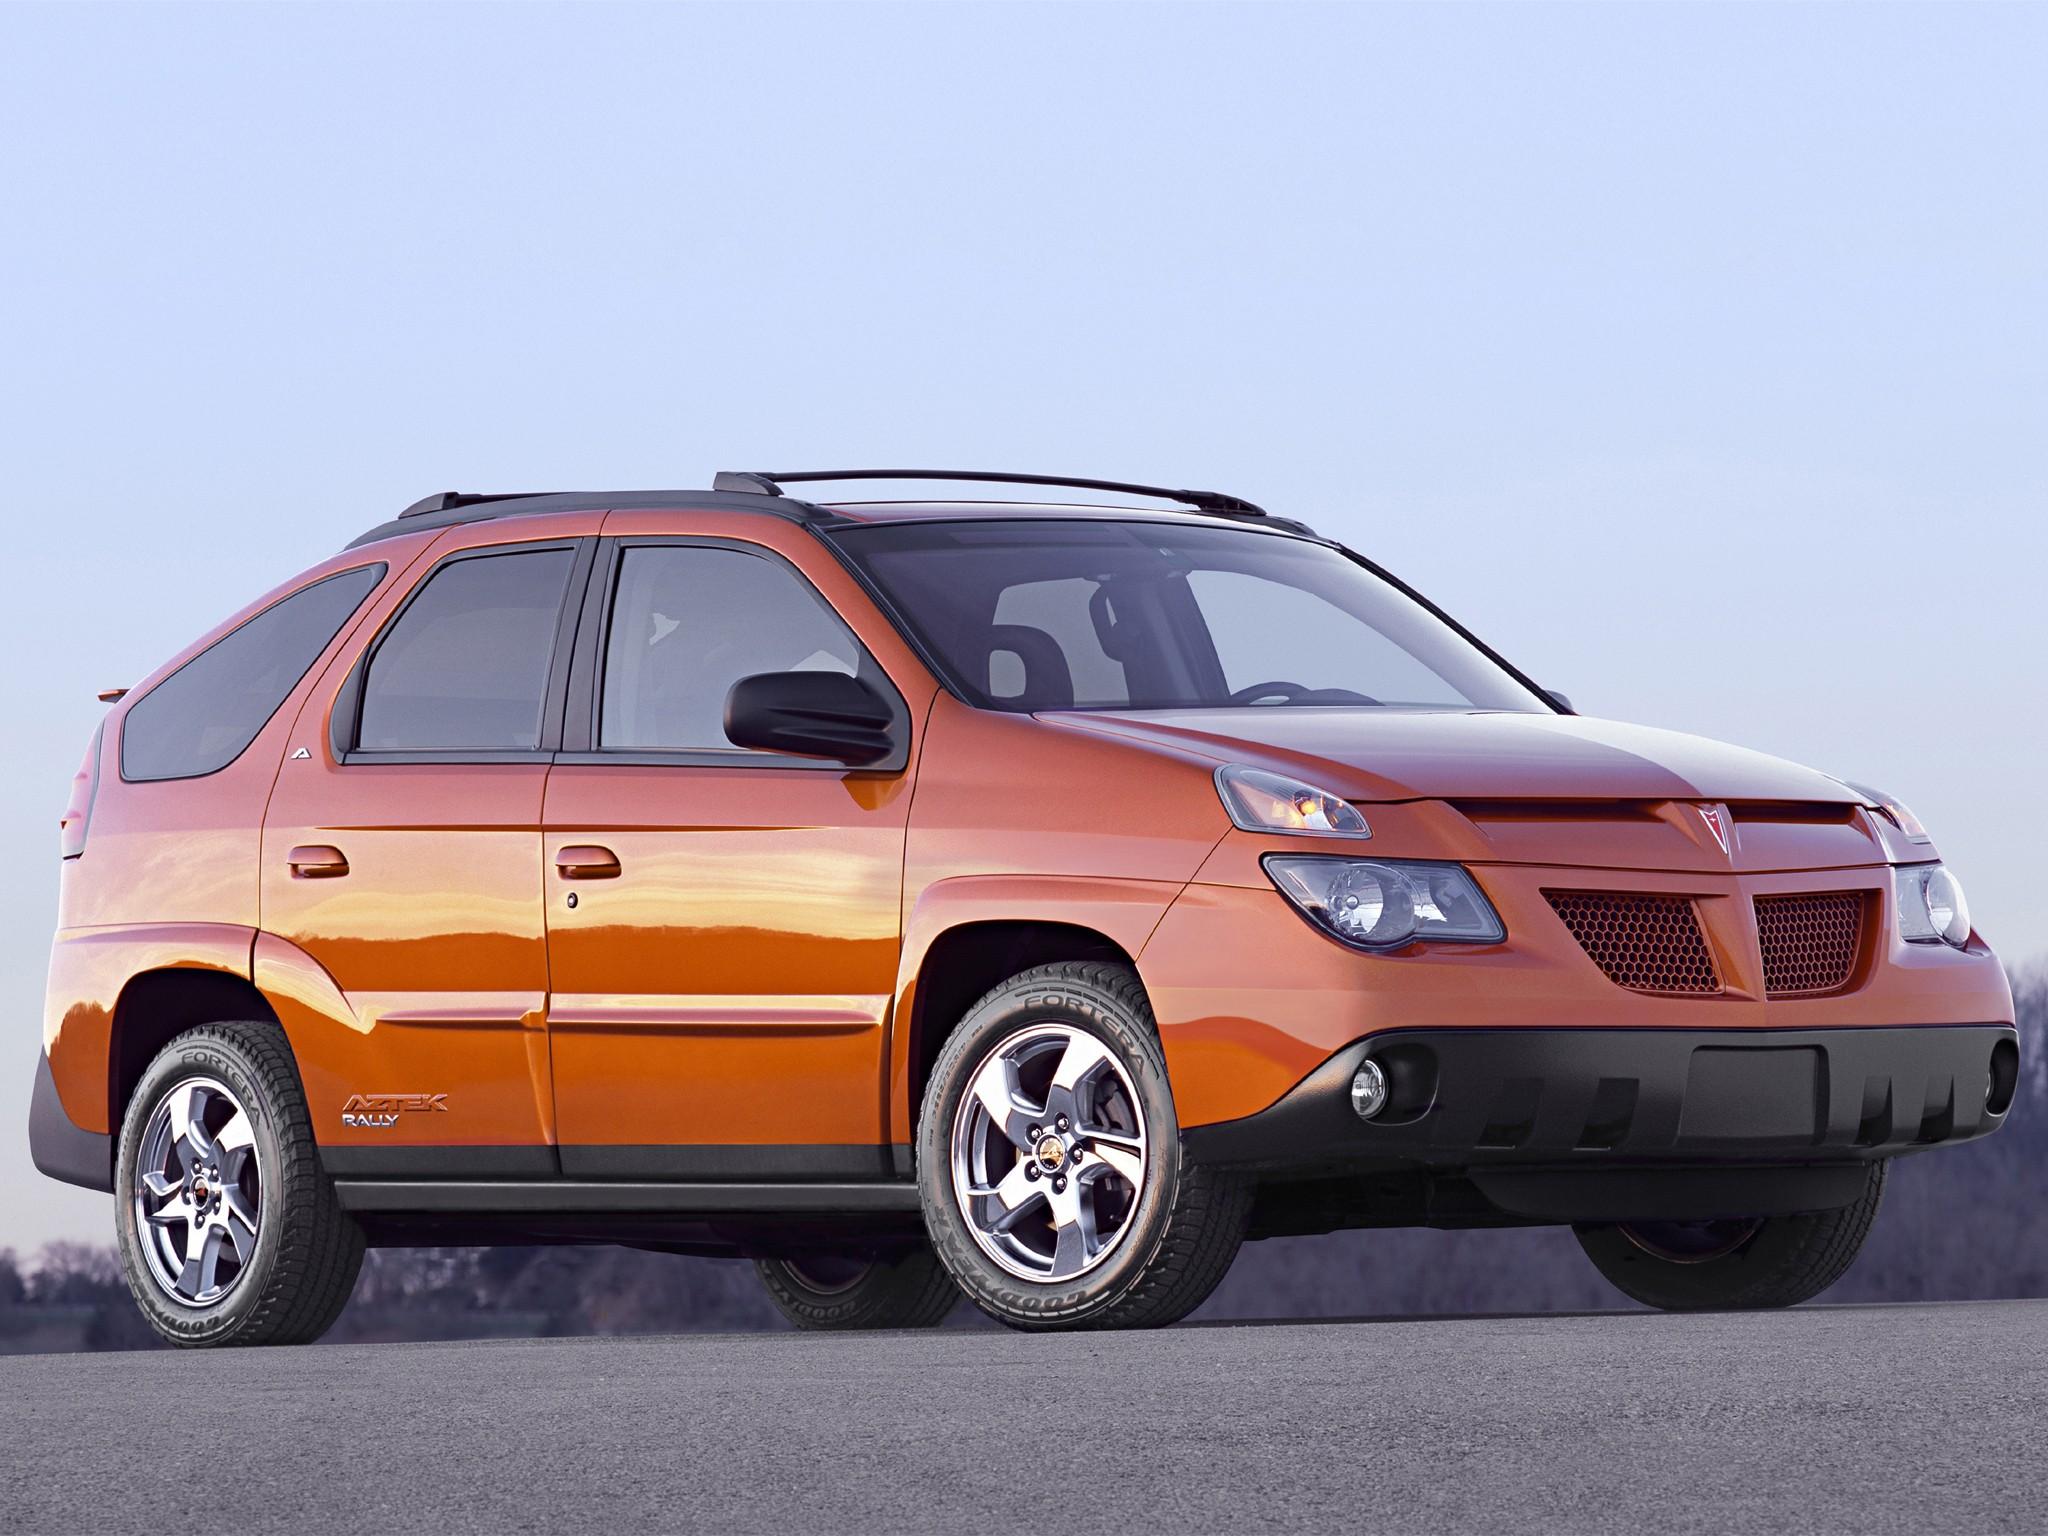 Pontiac Aztek Specs Photos 2000 2001 2002 2003 2004 2005 Autoevolution